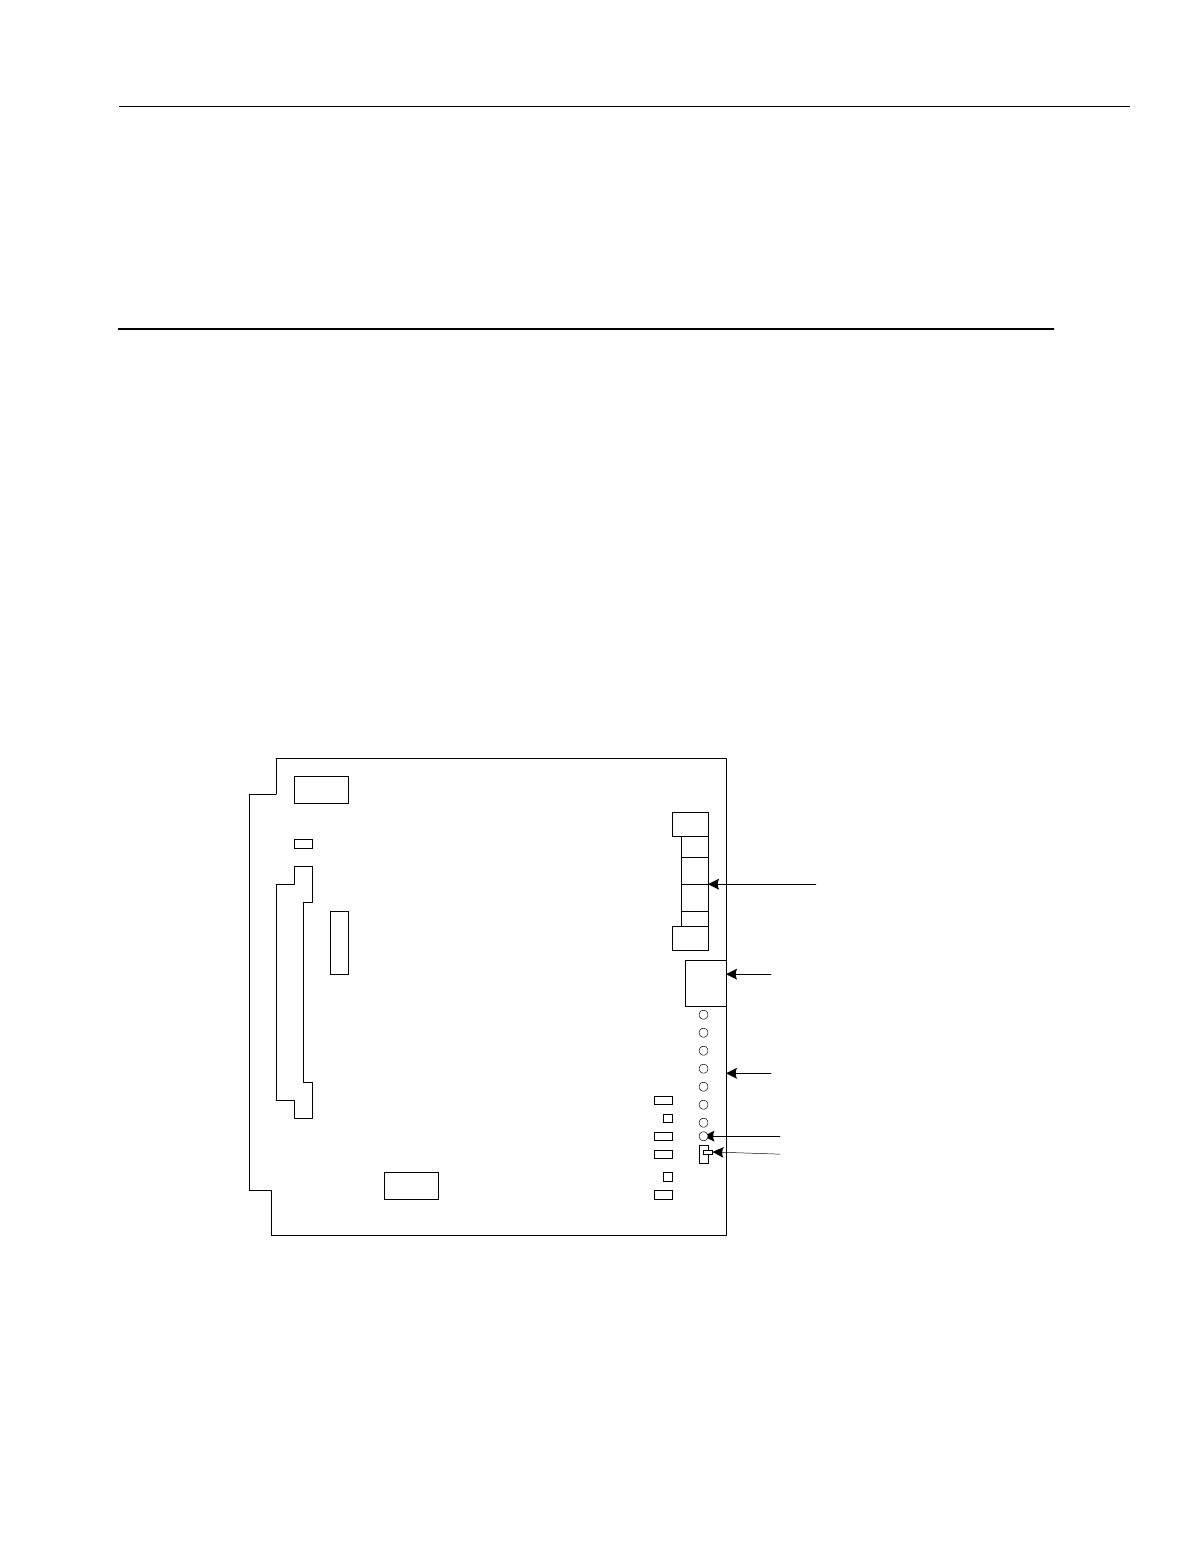 Iwatsu America Adix Bs Upcs Base Station User Manual Eba 2000 28 Sw F8 Arctic Cat Wiring Diagram Free Download Schematic En